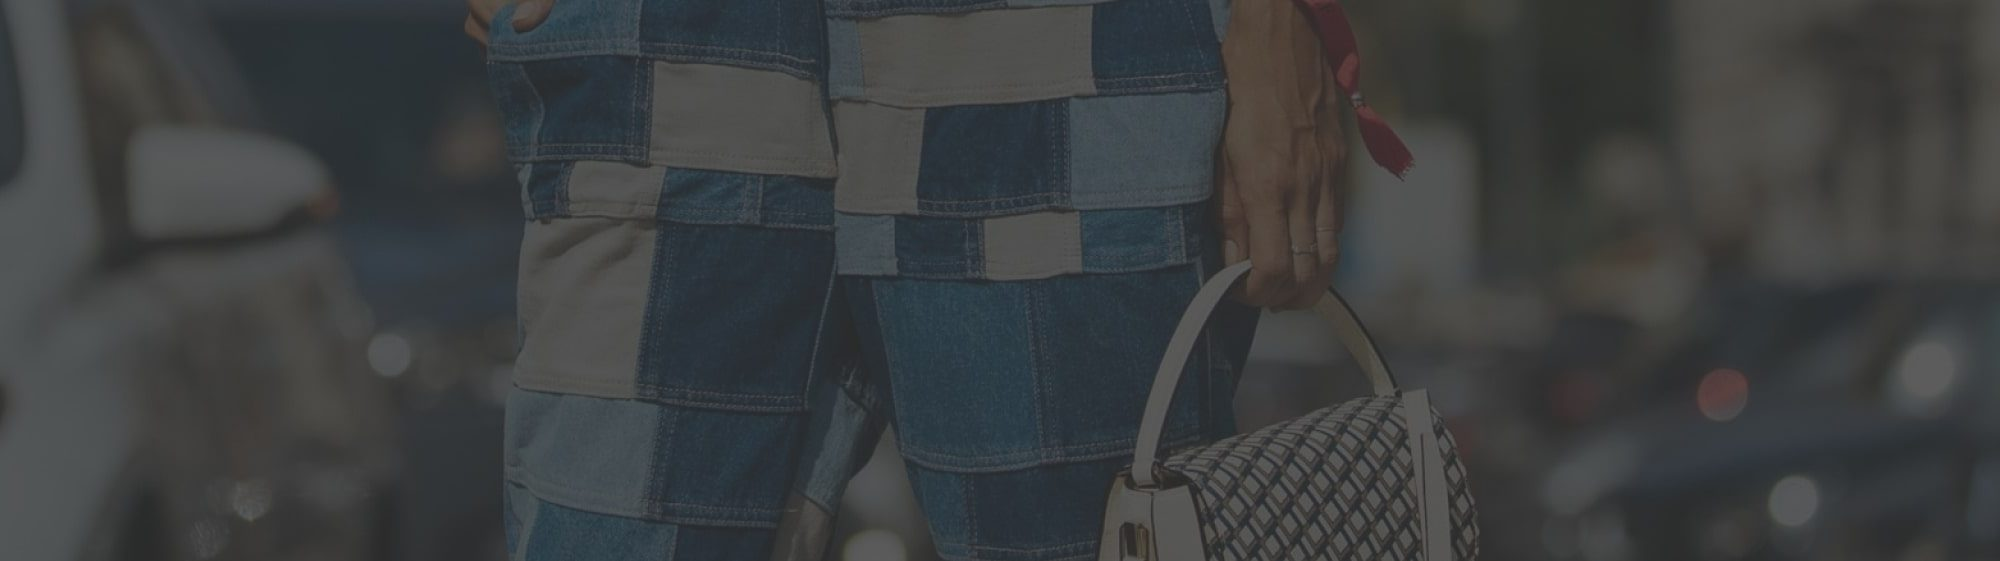 manzara-fashion-header